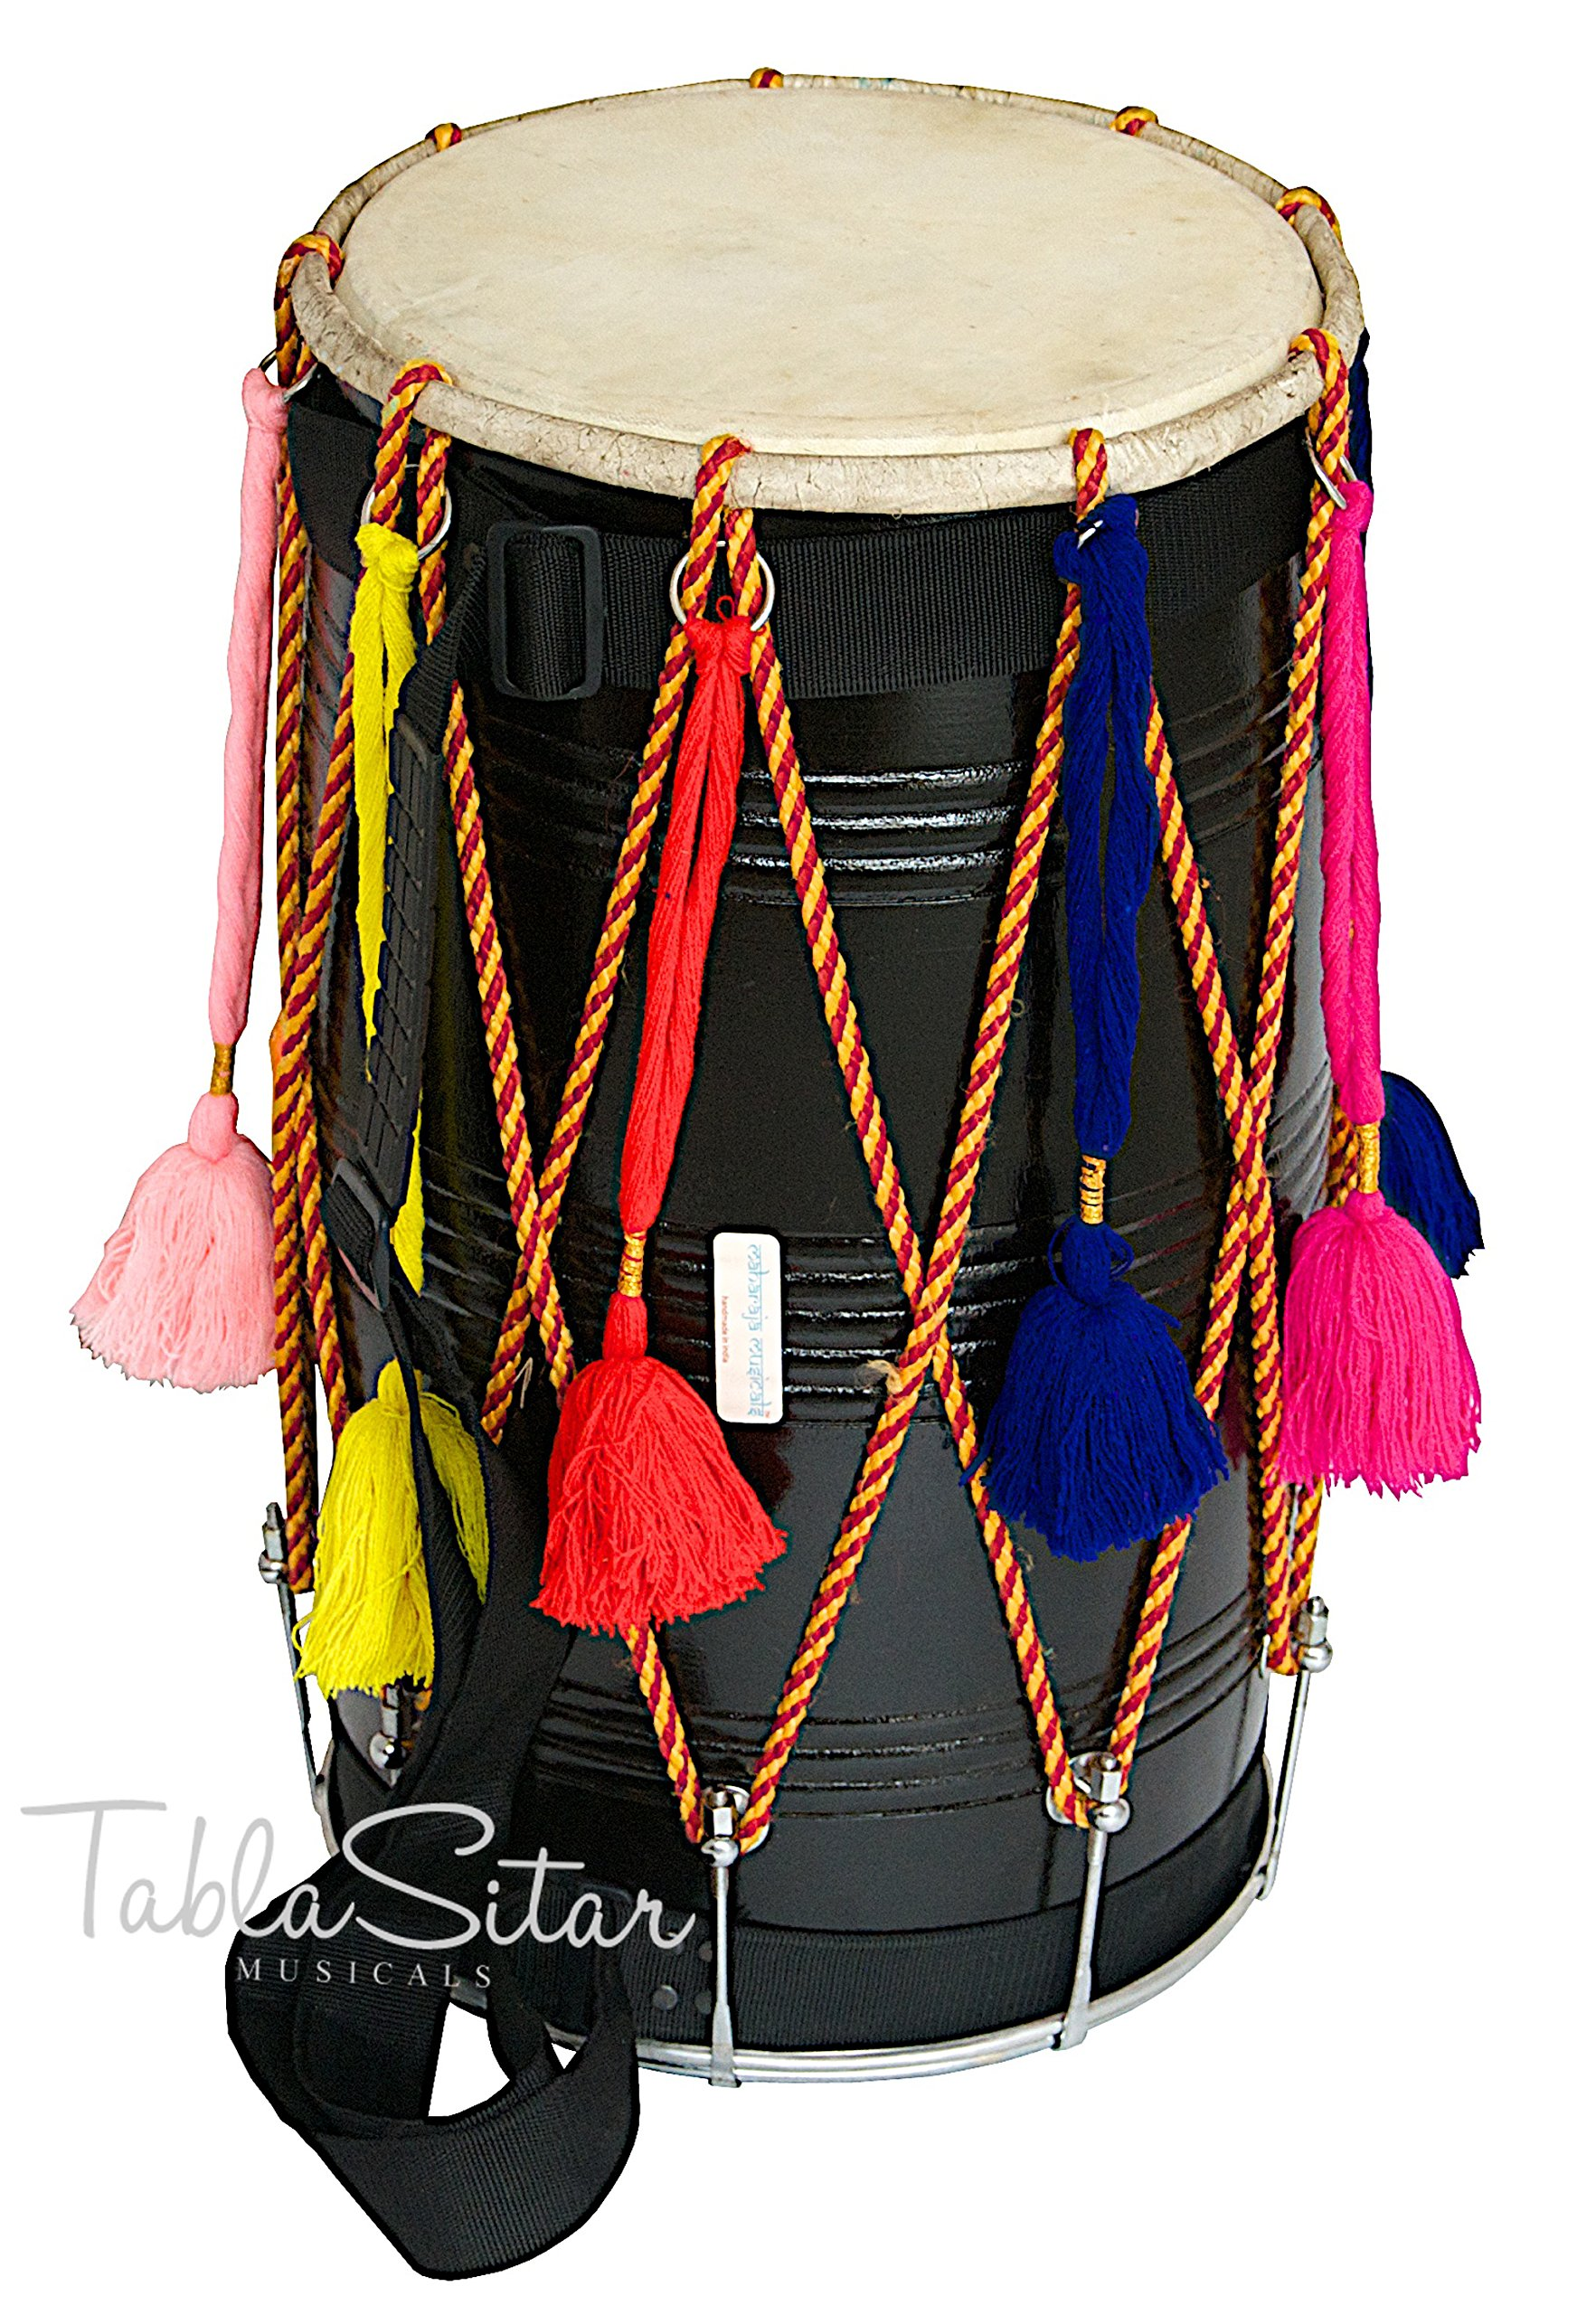 Maharaja Musicals Bhangra Dhol Drum, Mango Wood, Black, Barrel Shaped, Padded Bag, Beaters, Nylon Strap, Punjabi Dhol Drum (PDI-CE) by Maharaja Musicals